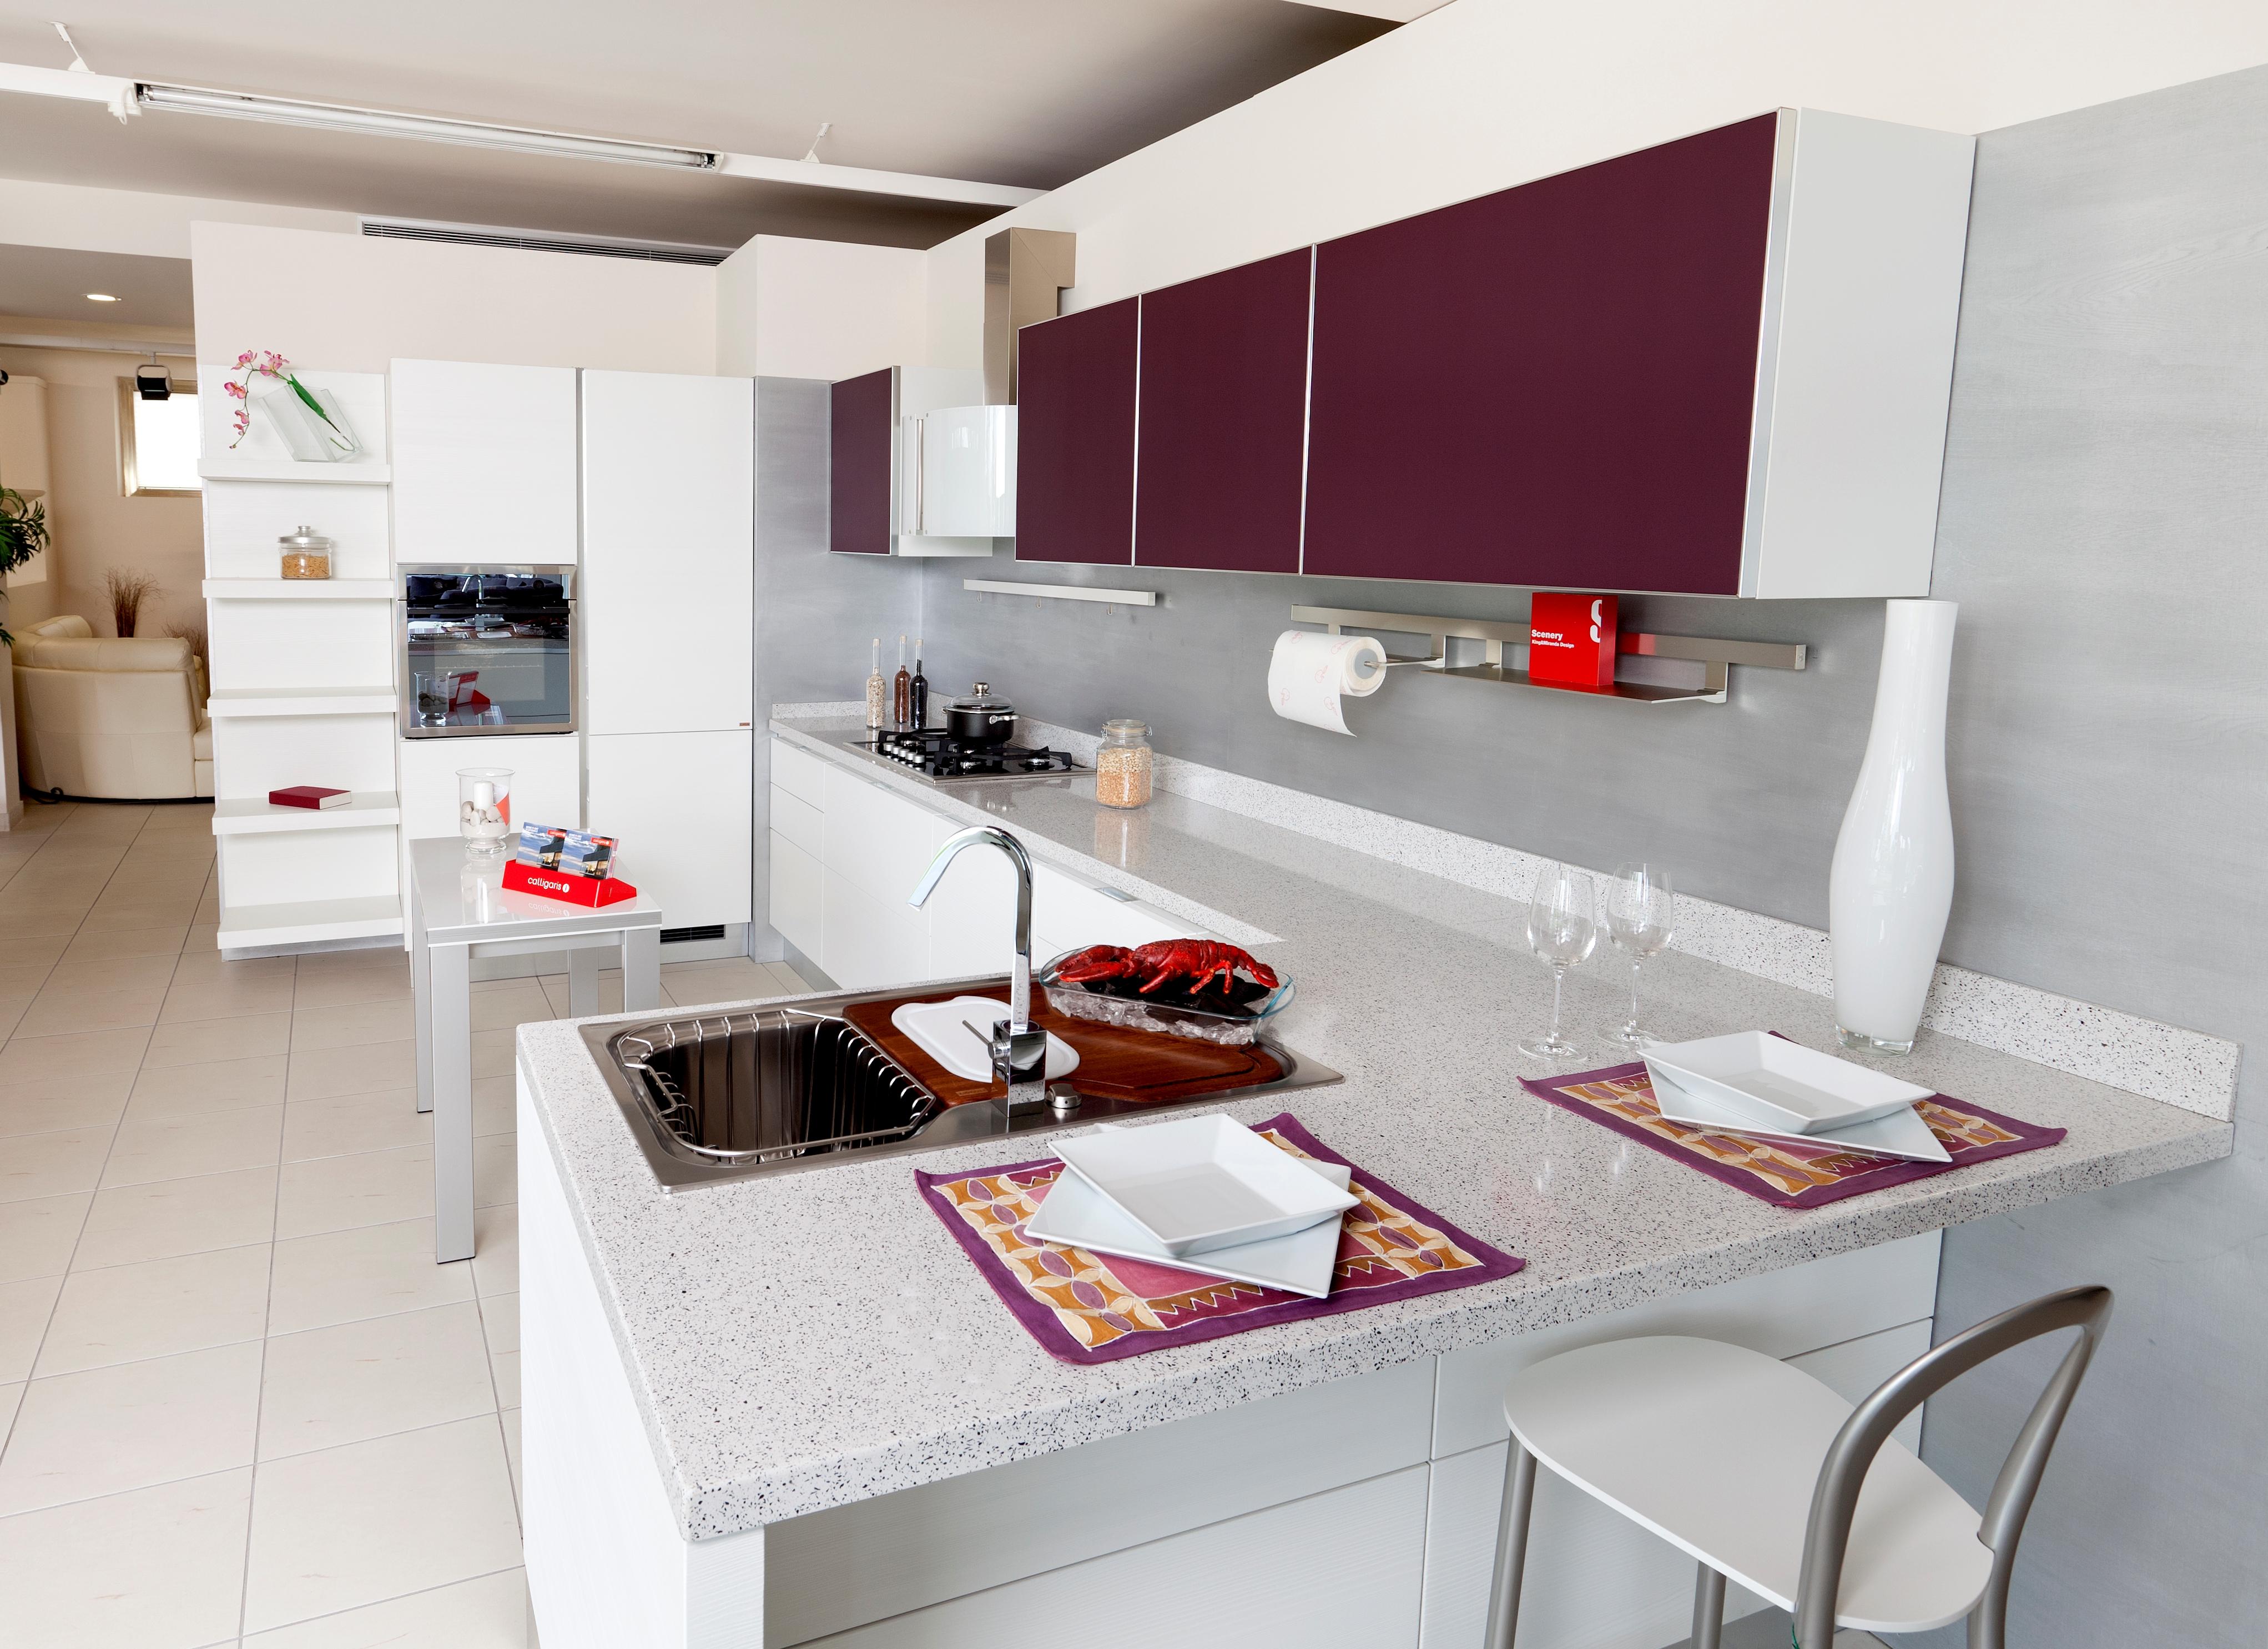 Cucina scavolini offerta 14427 cucine a prezzi scontati - Cucine 3 metri scavolini ...